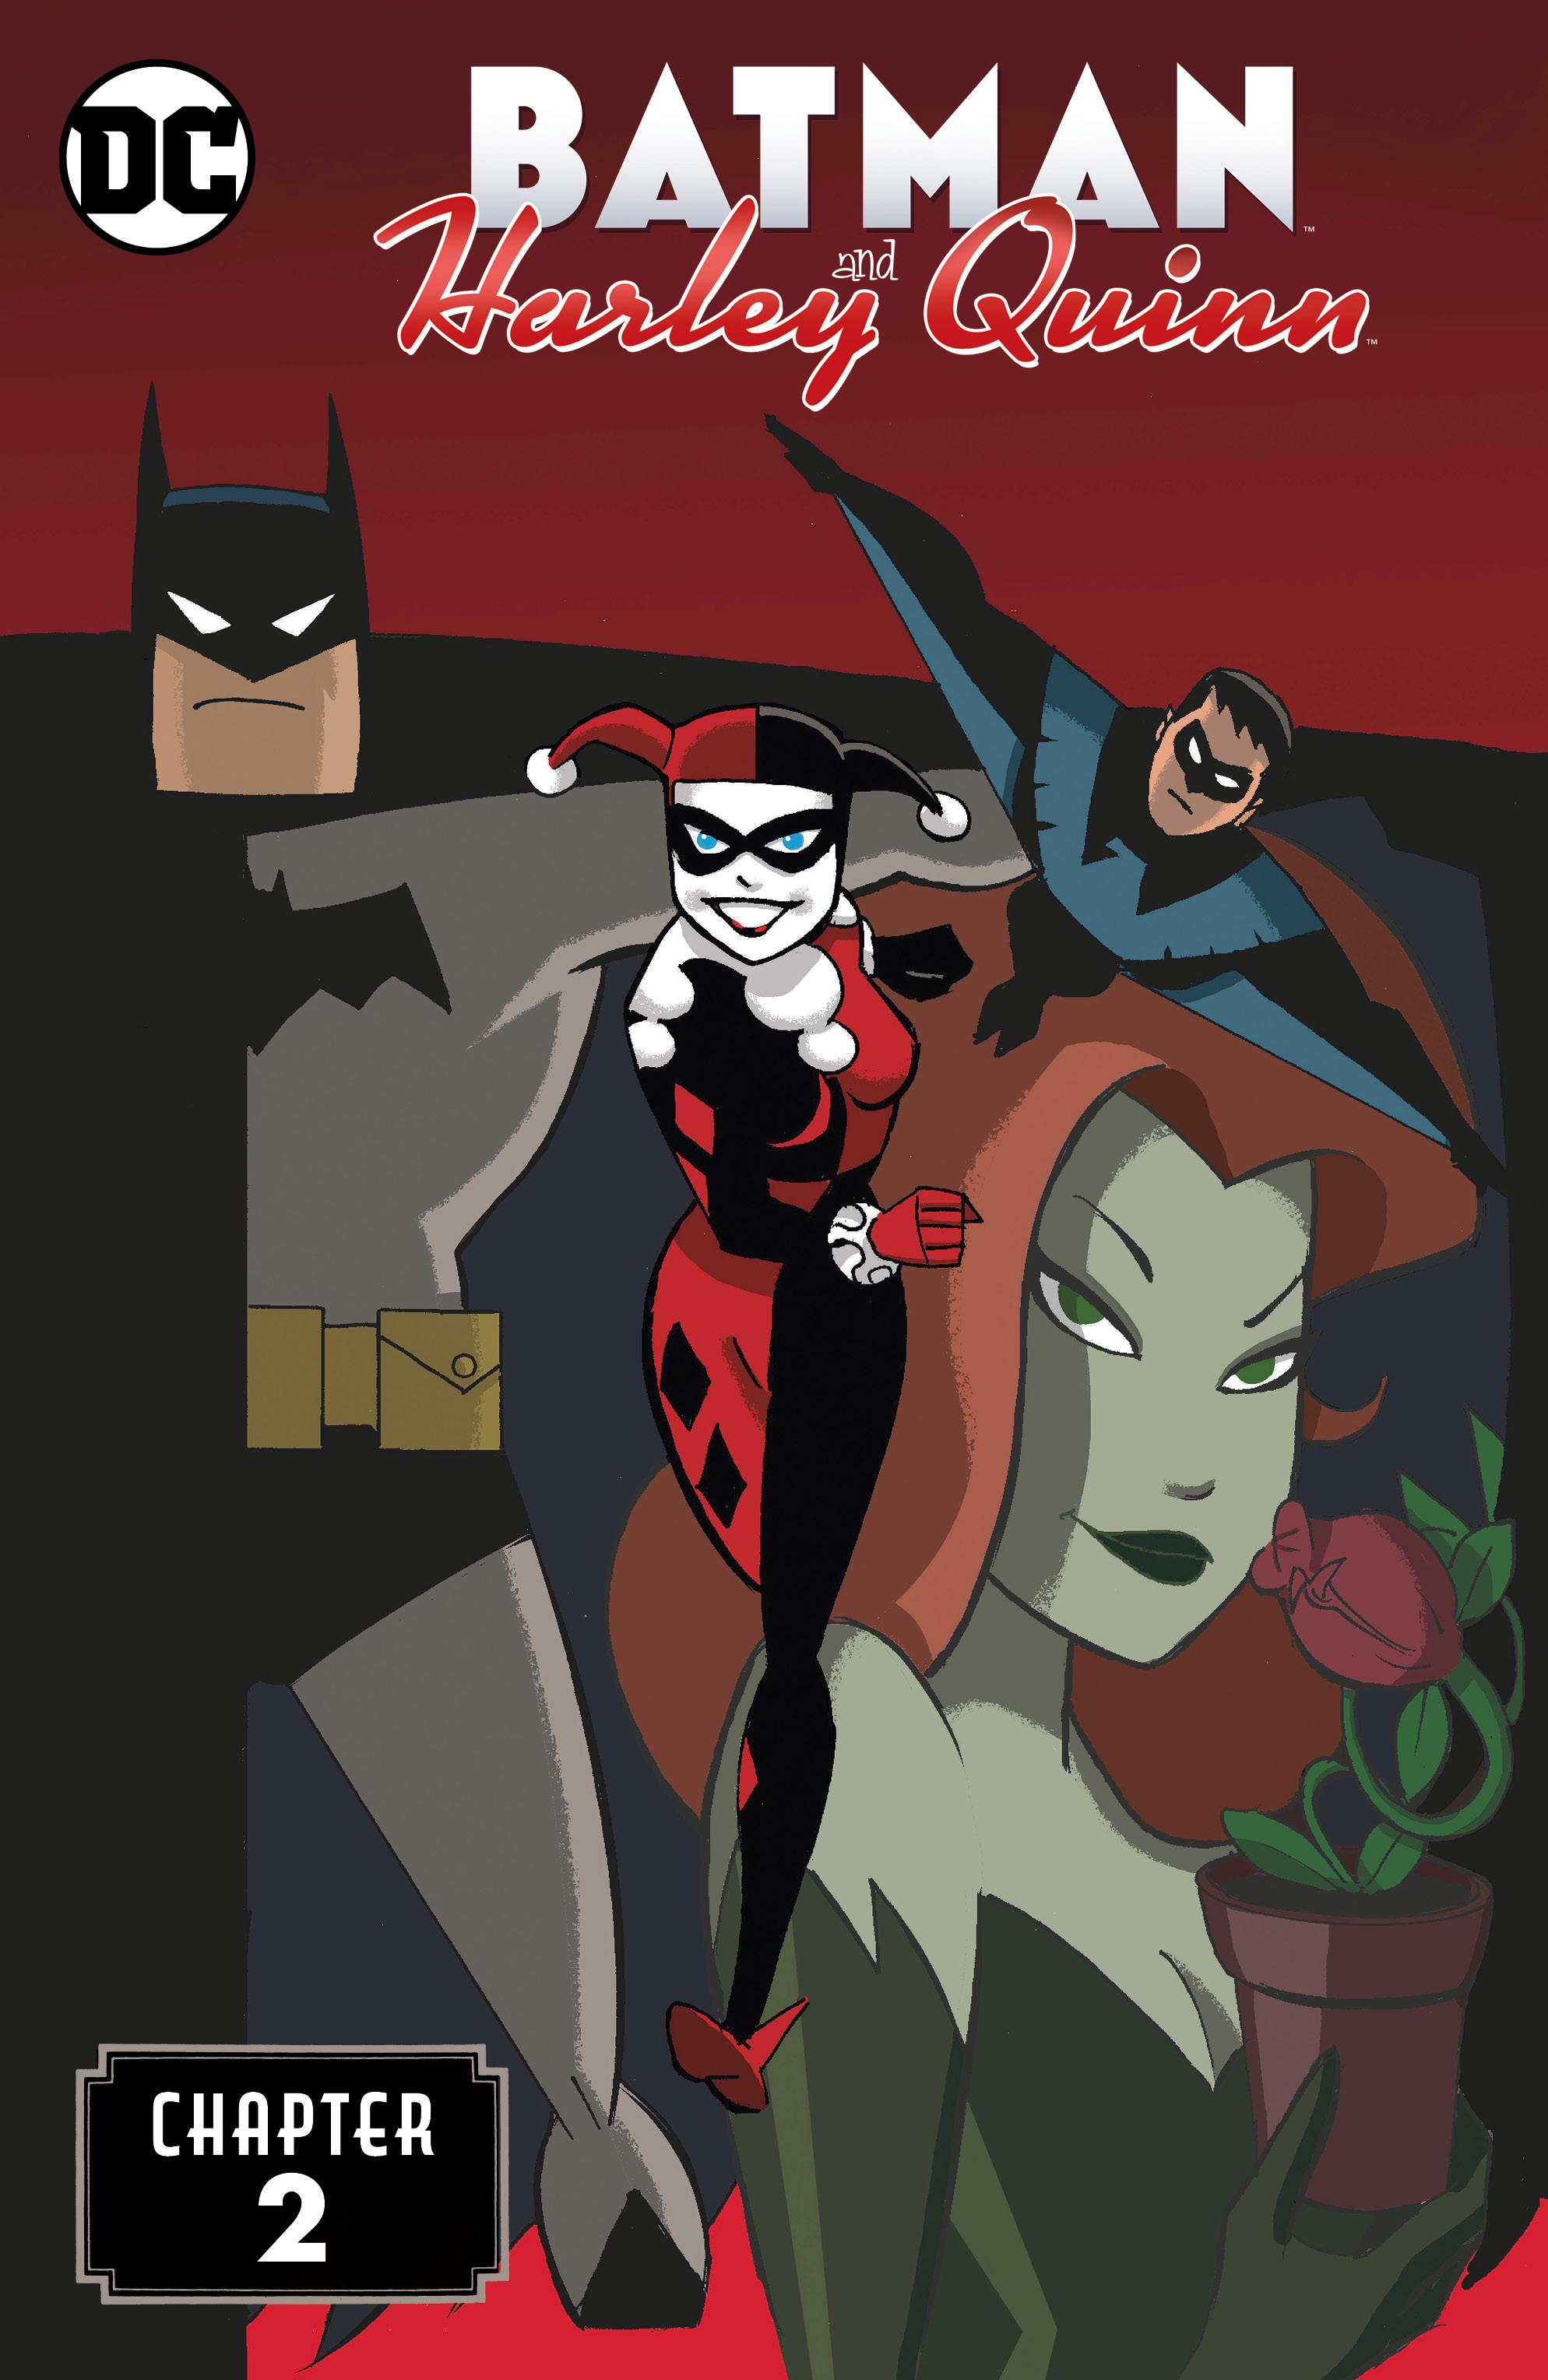 Batman and Harley Quinn Vol 1 2 (Digital)